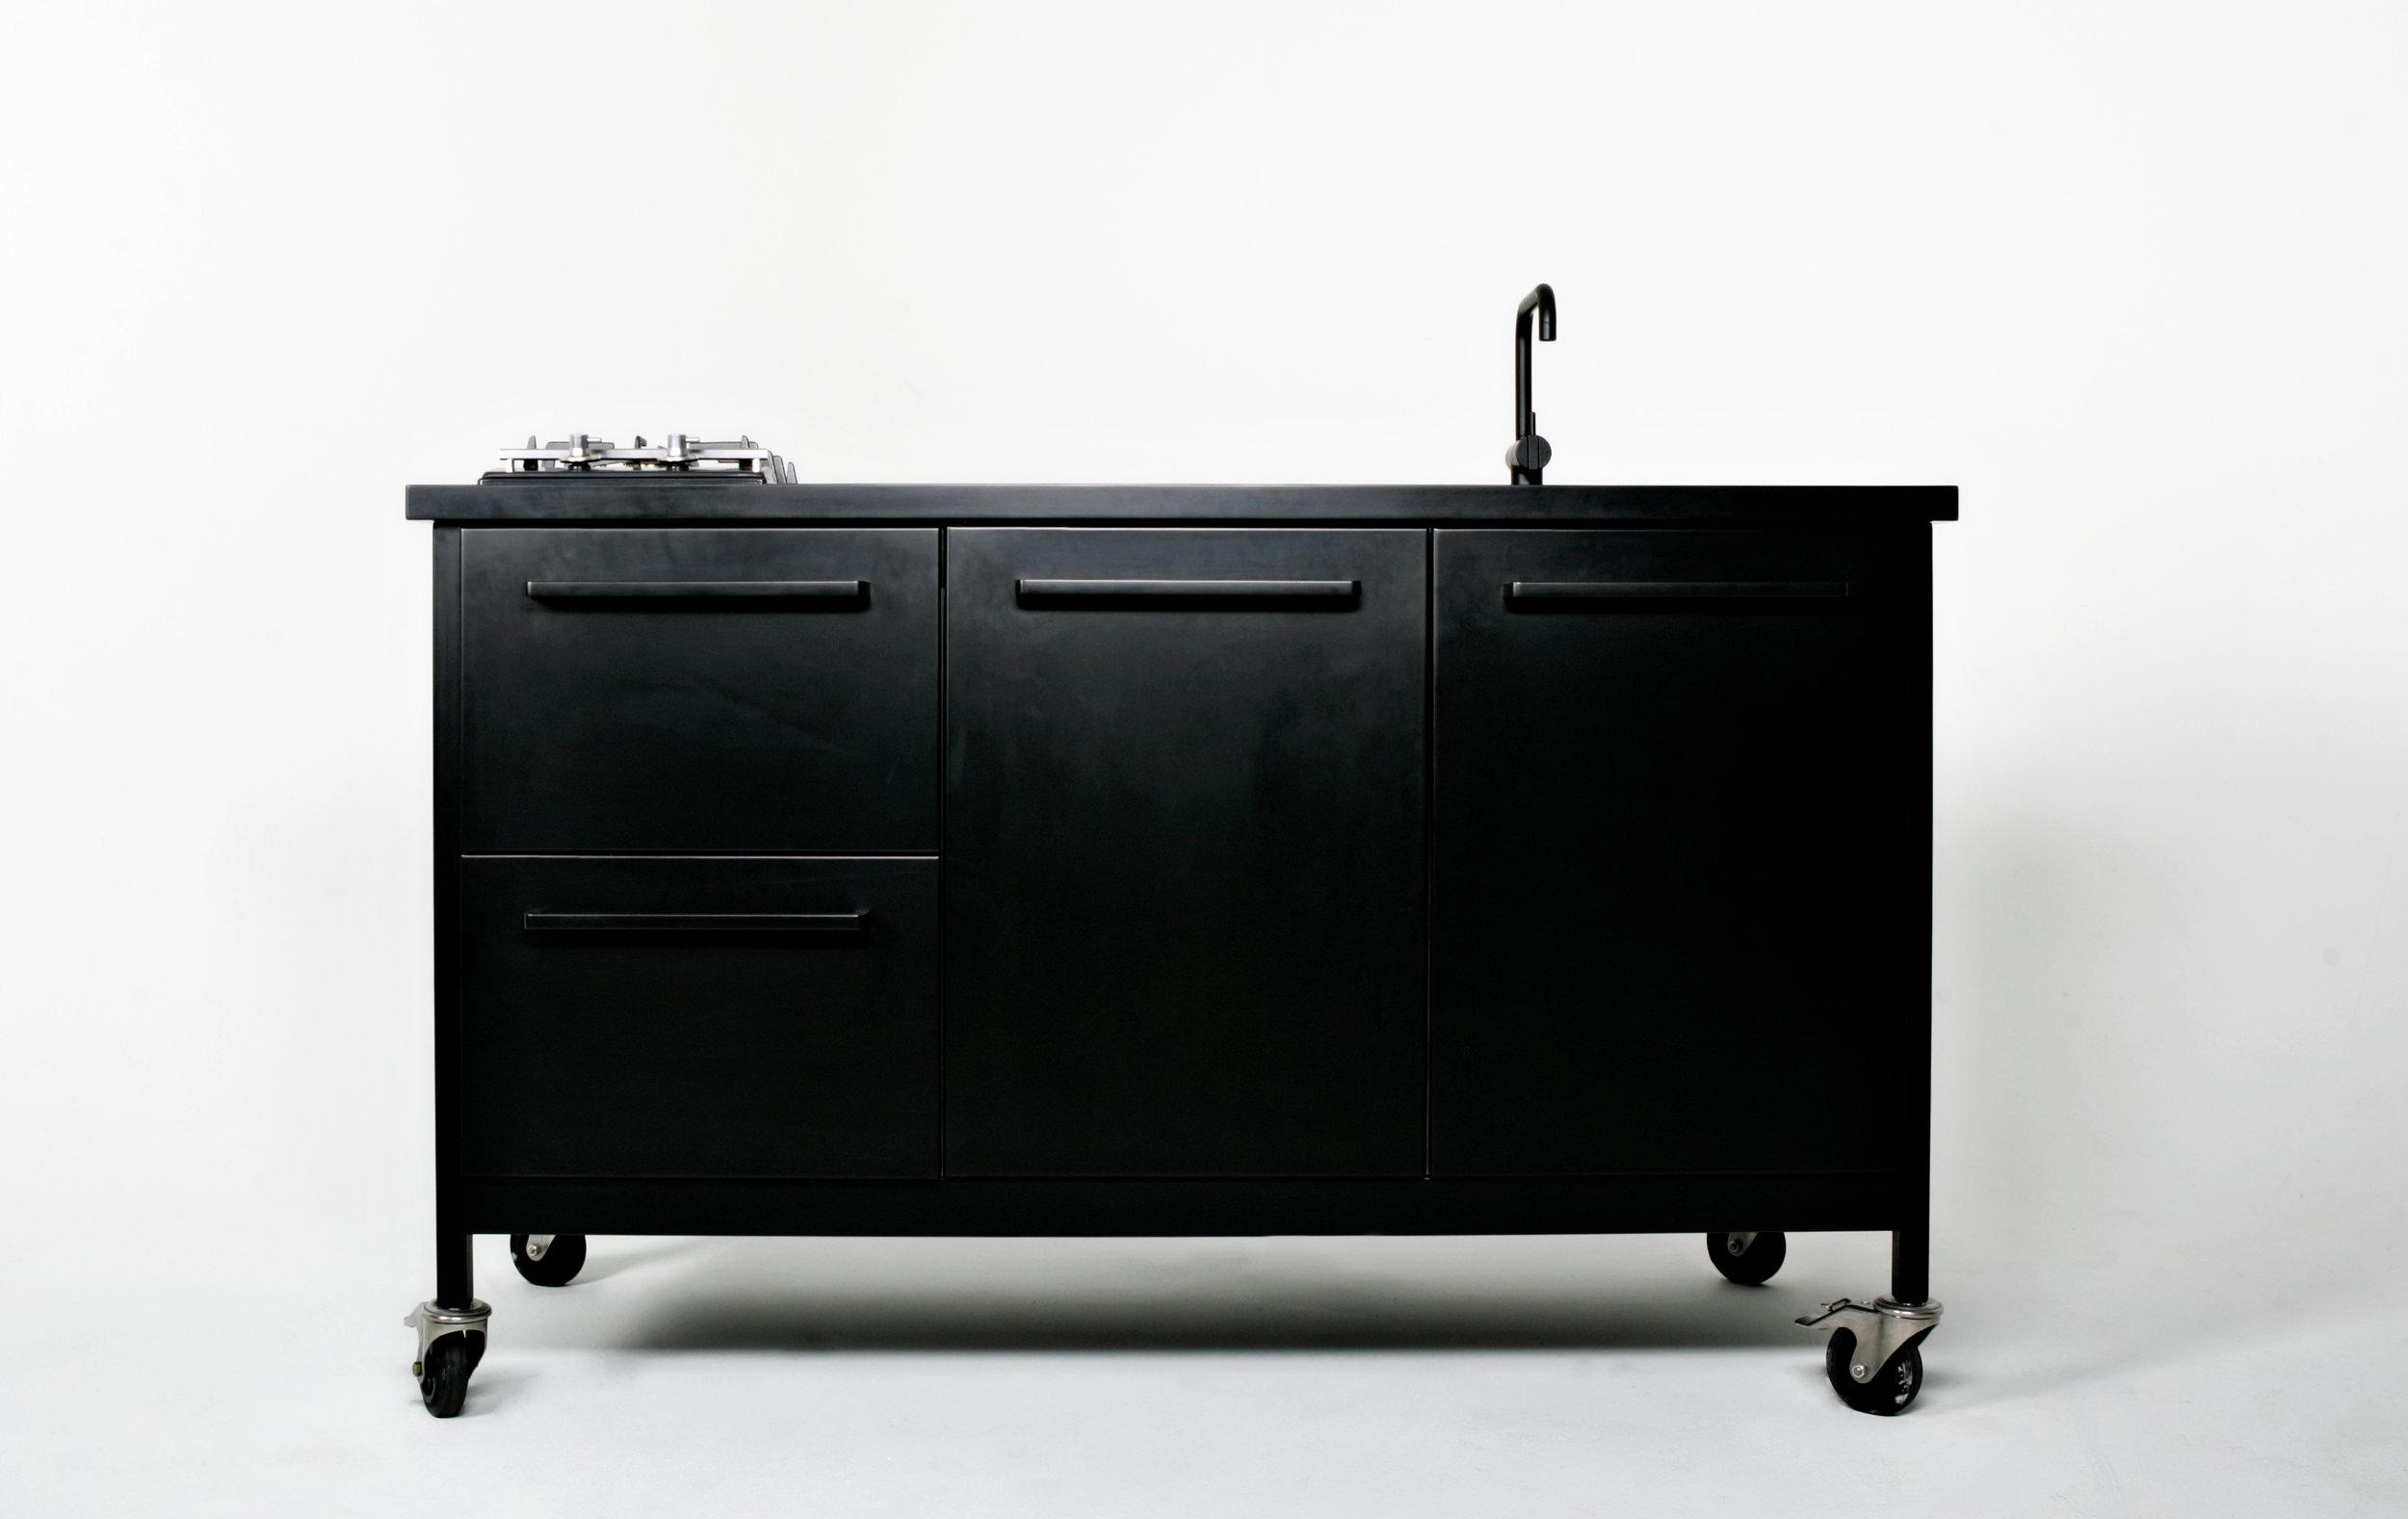 Travel Kitchen Black Cph Square 02.jpg